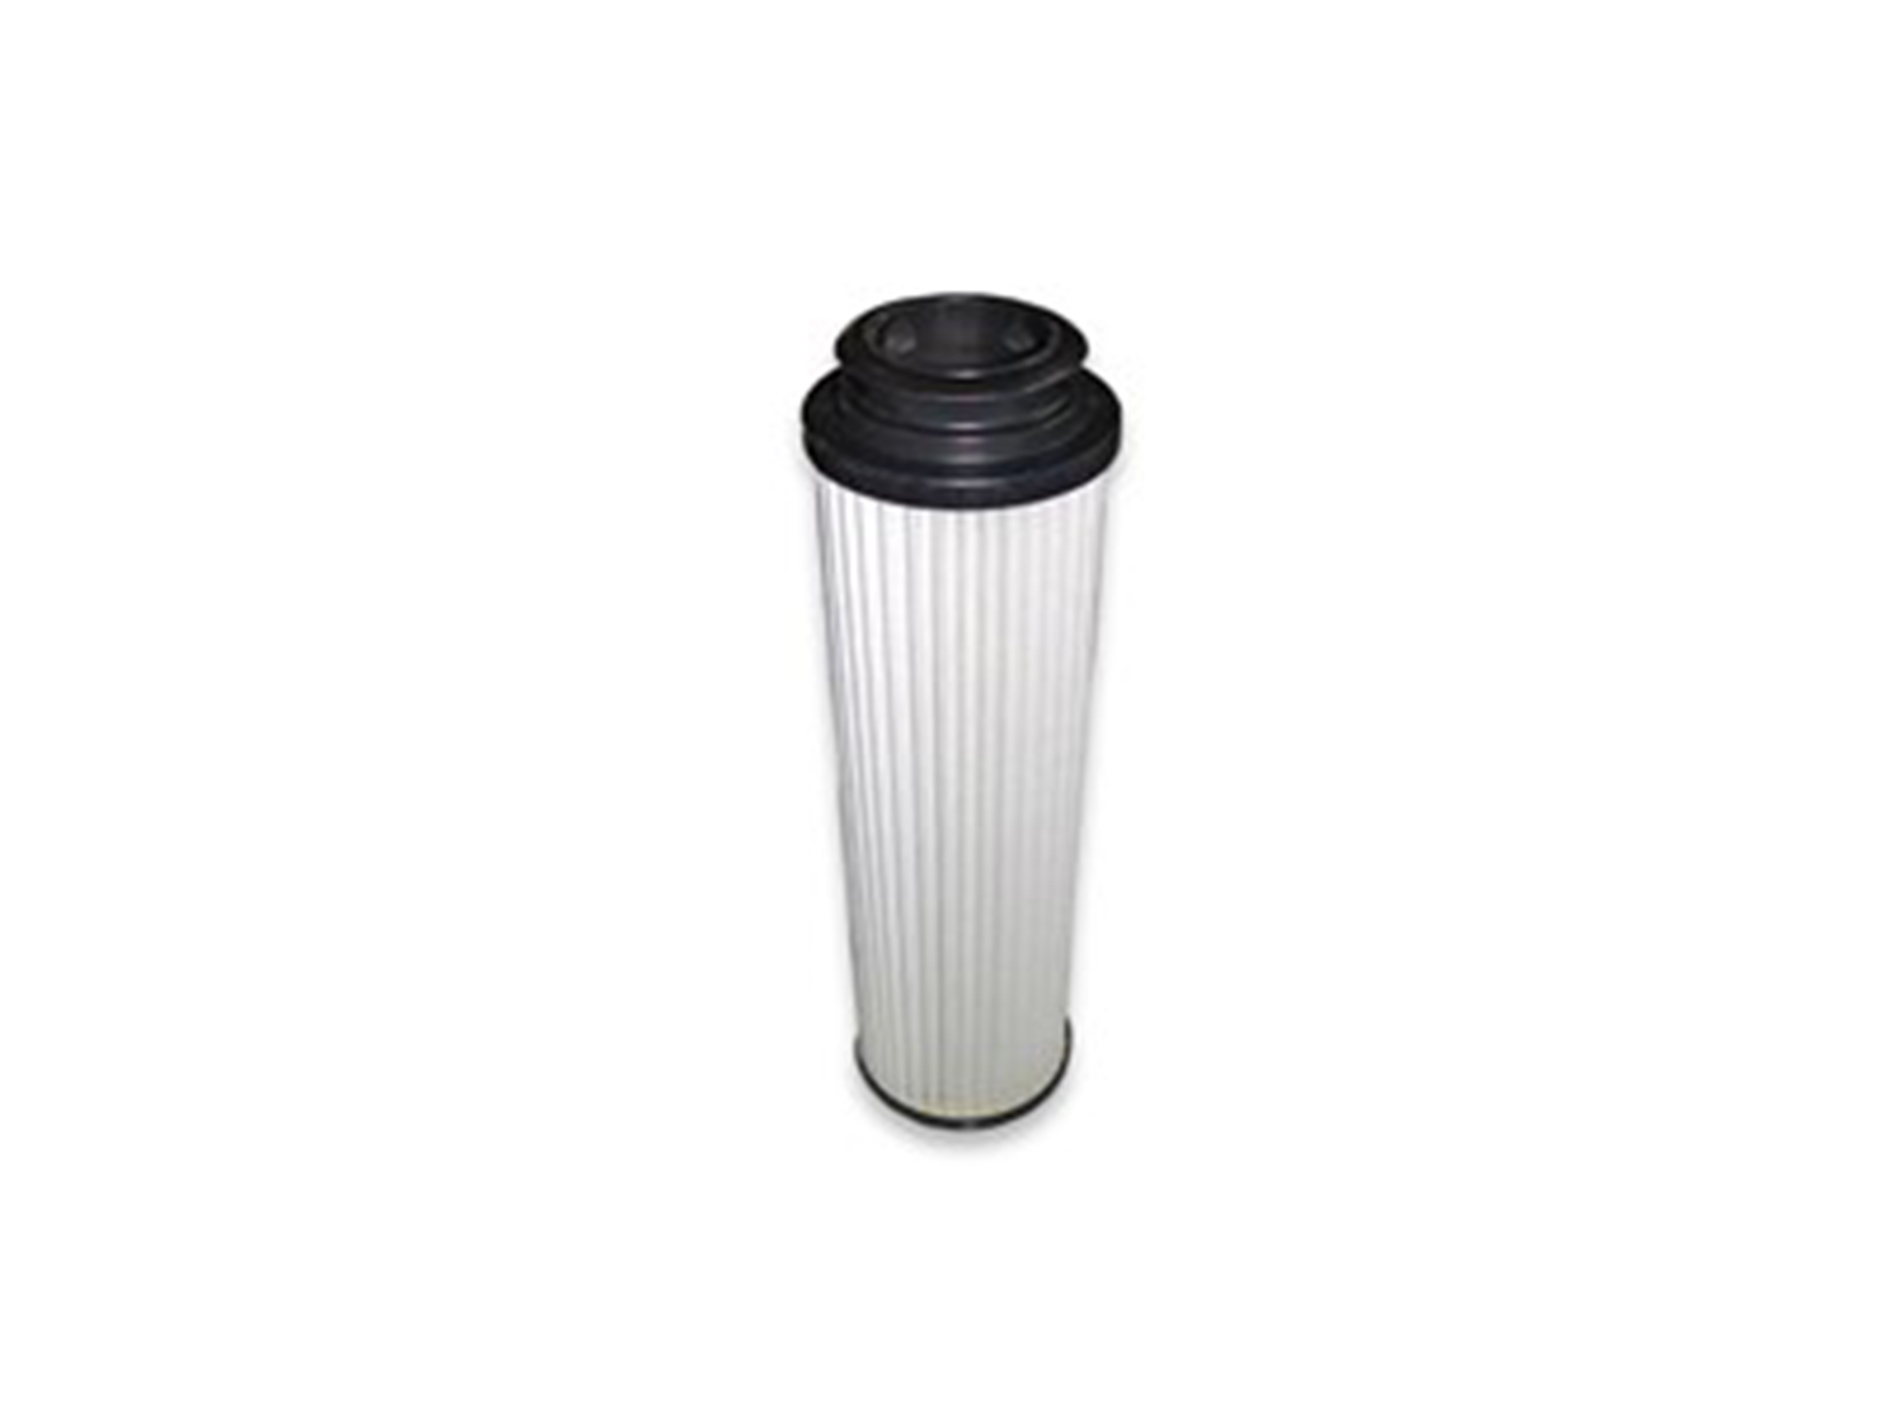 Hoover Upright Vacuum Hepa Cartridge Filter Cardy Vacuum